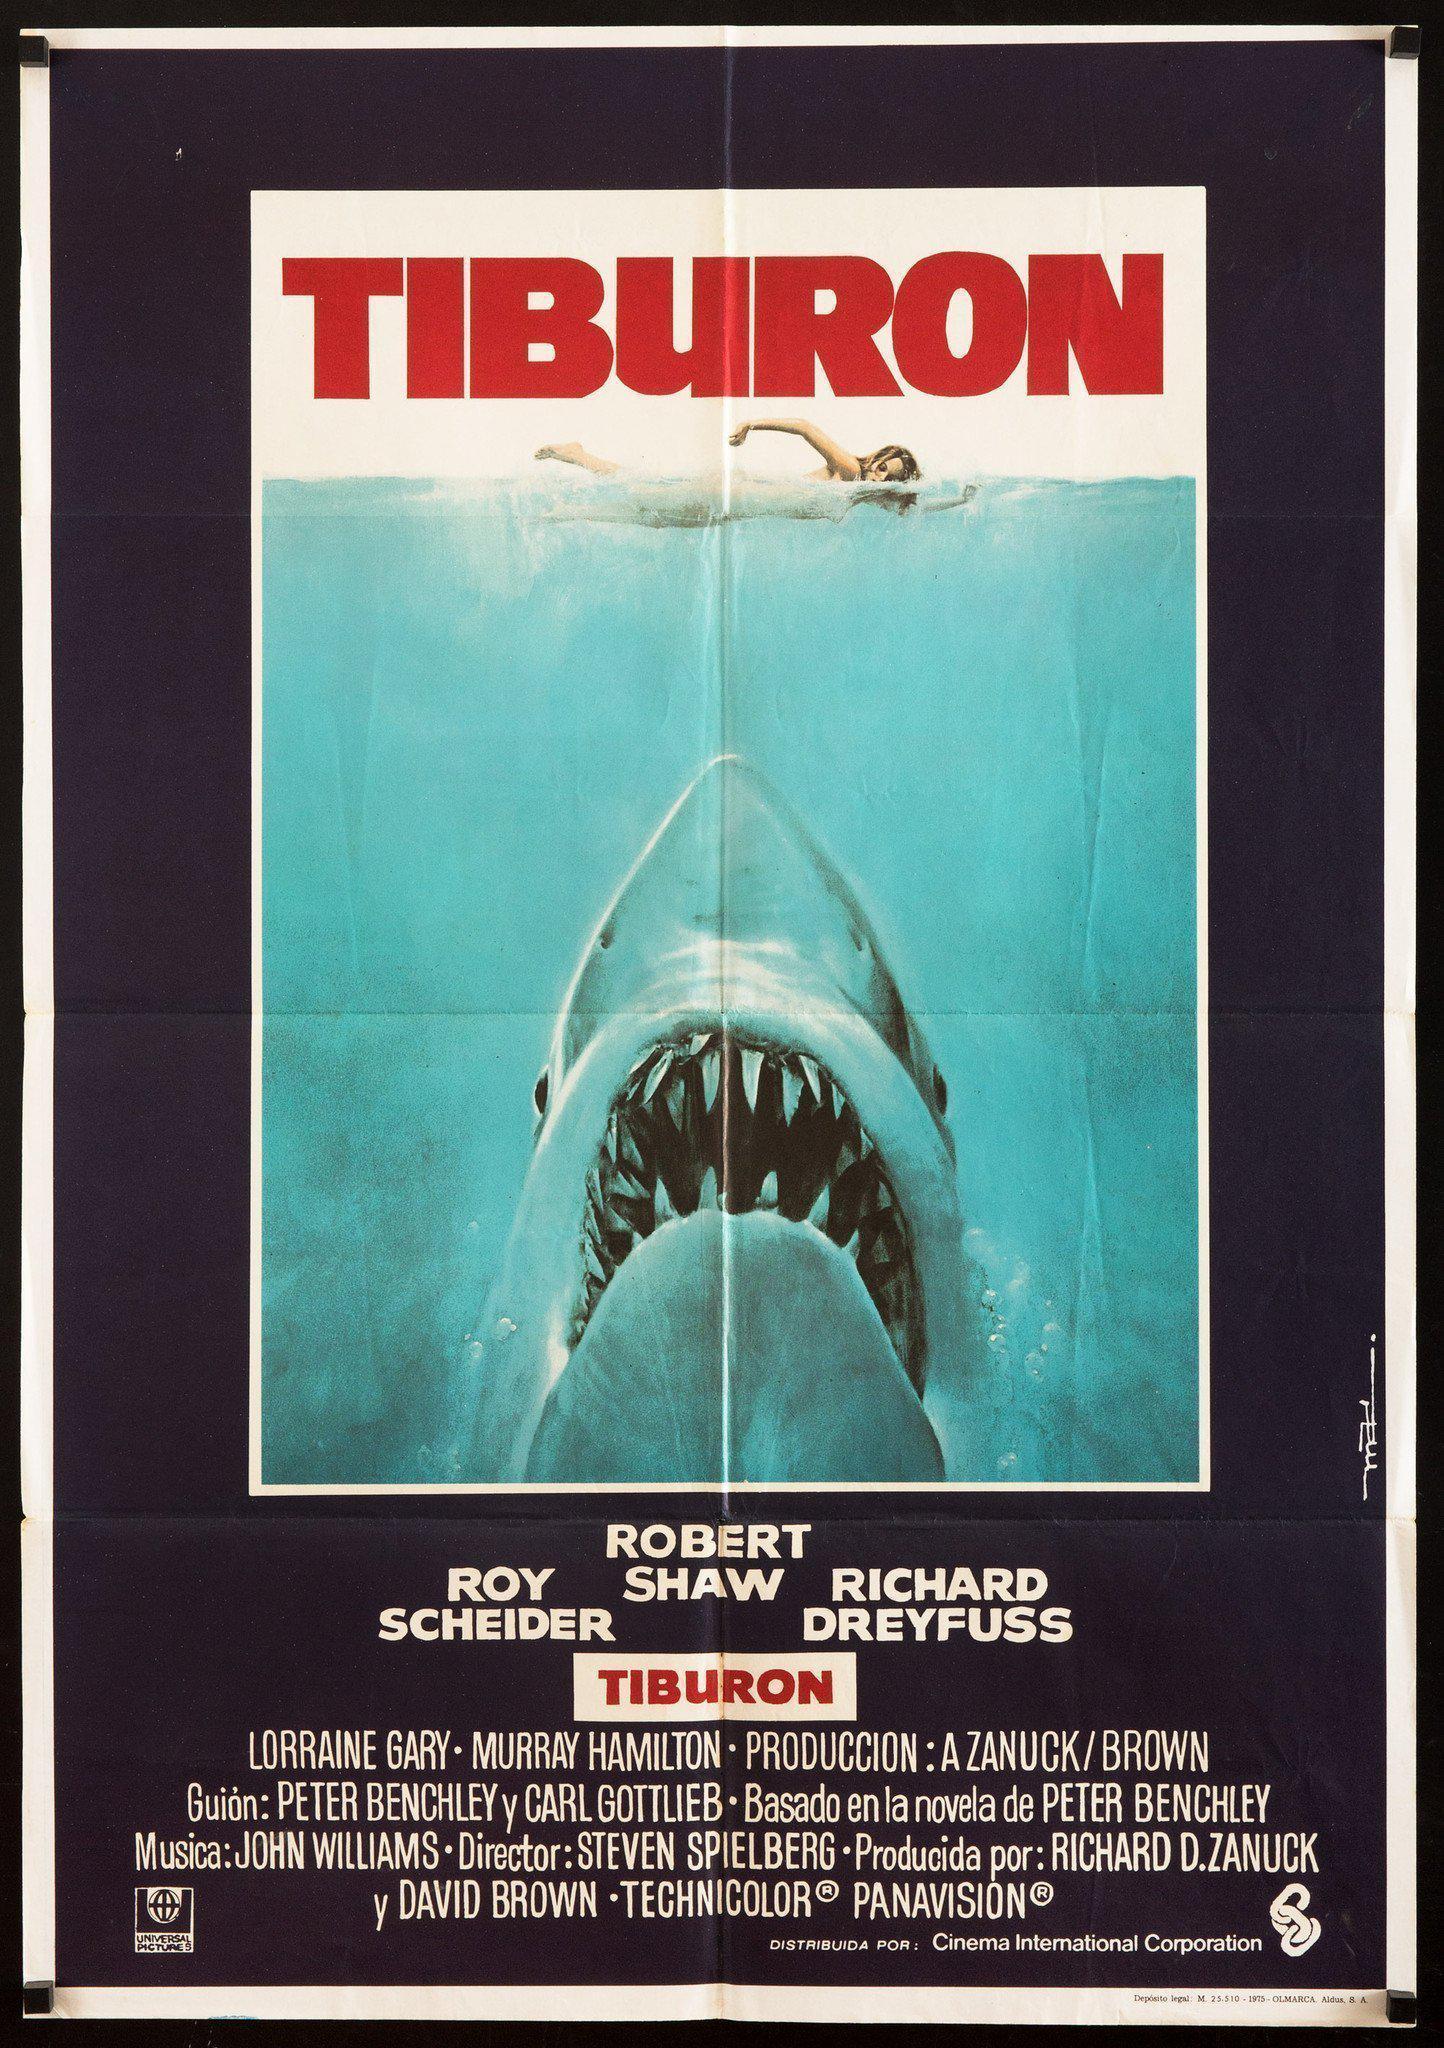 jaws tiburon movie poster 1 sheet 27x41 original vintage movie poster 6715